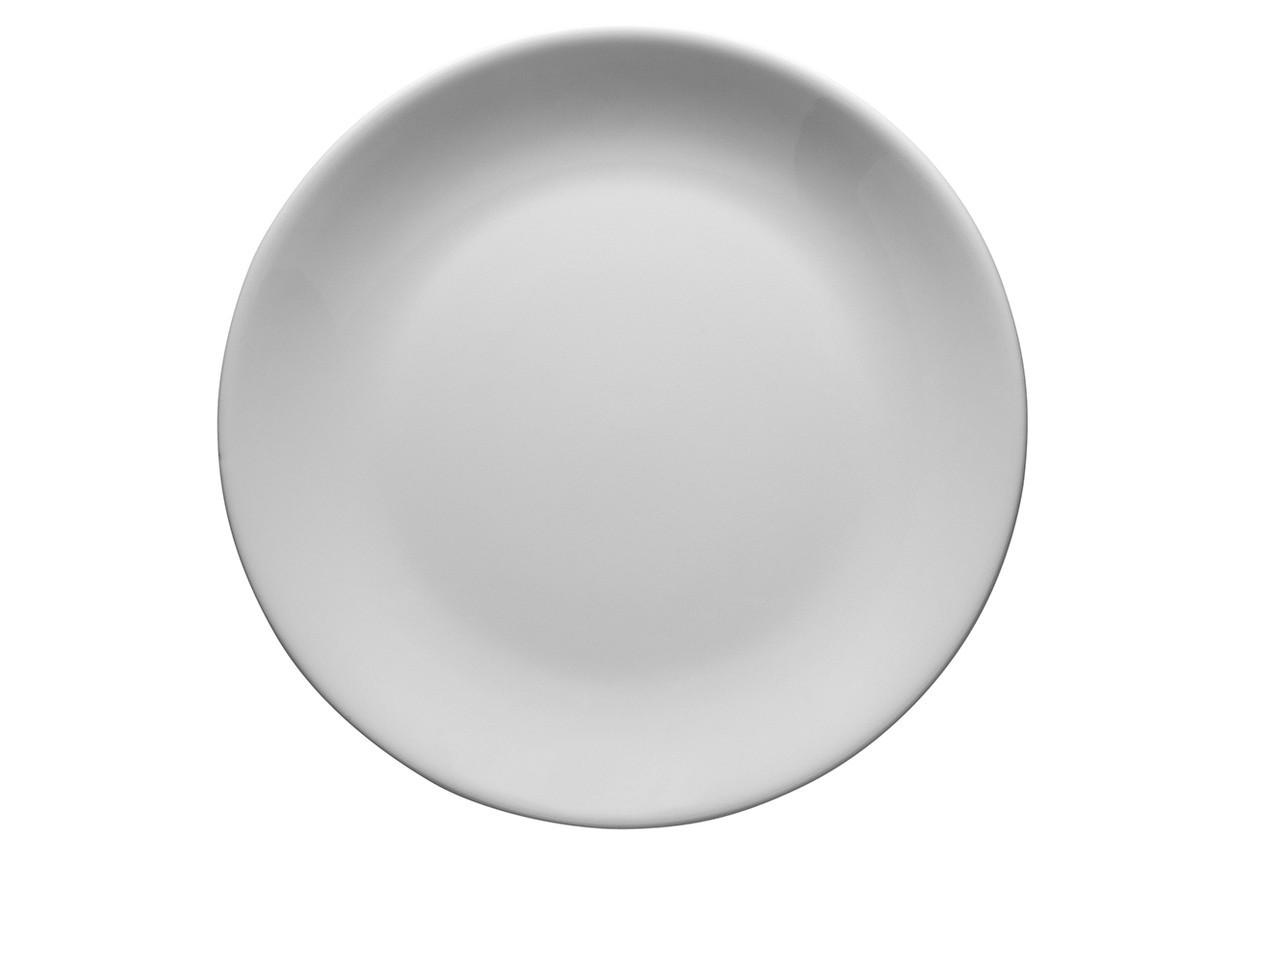 Тарелка мелкая 17 см Ent Otel